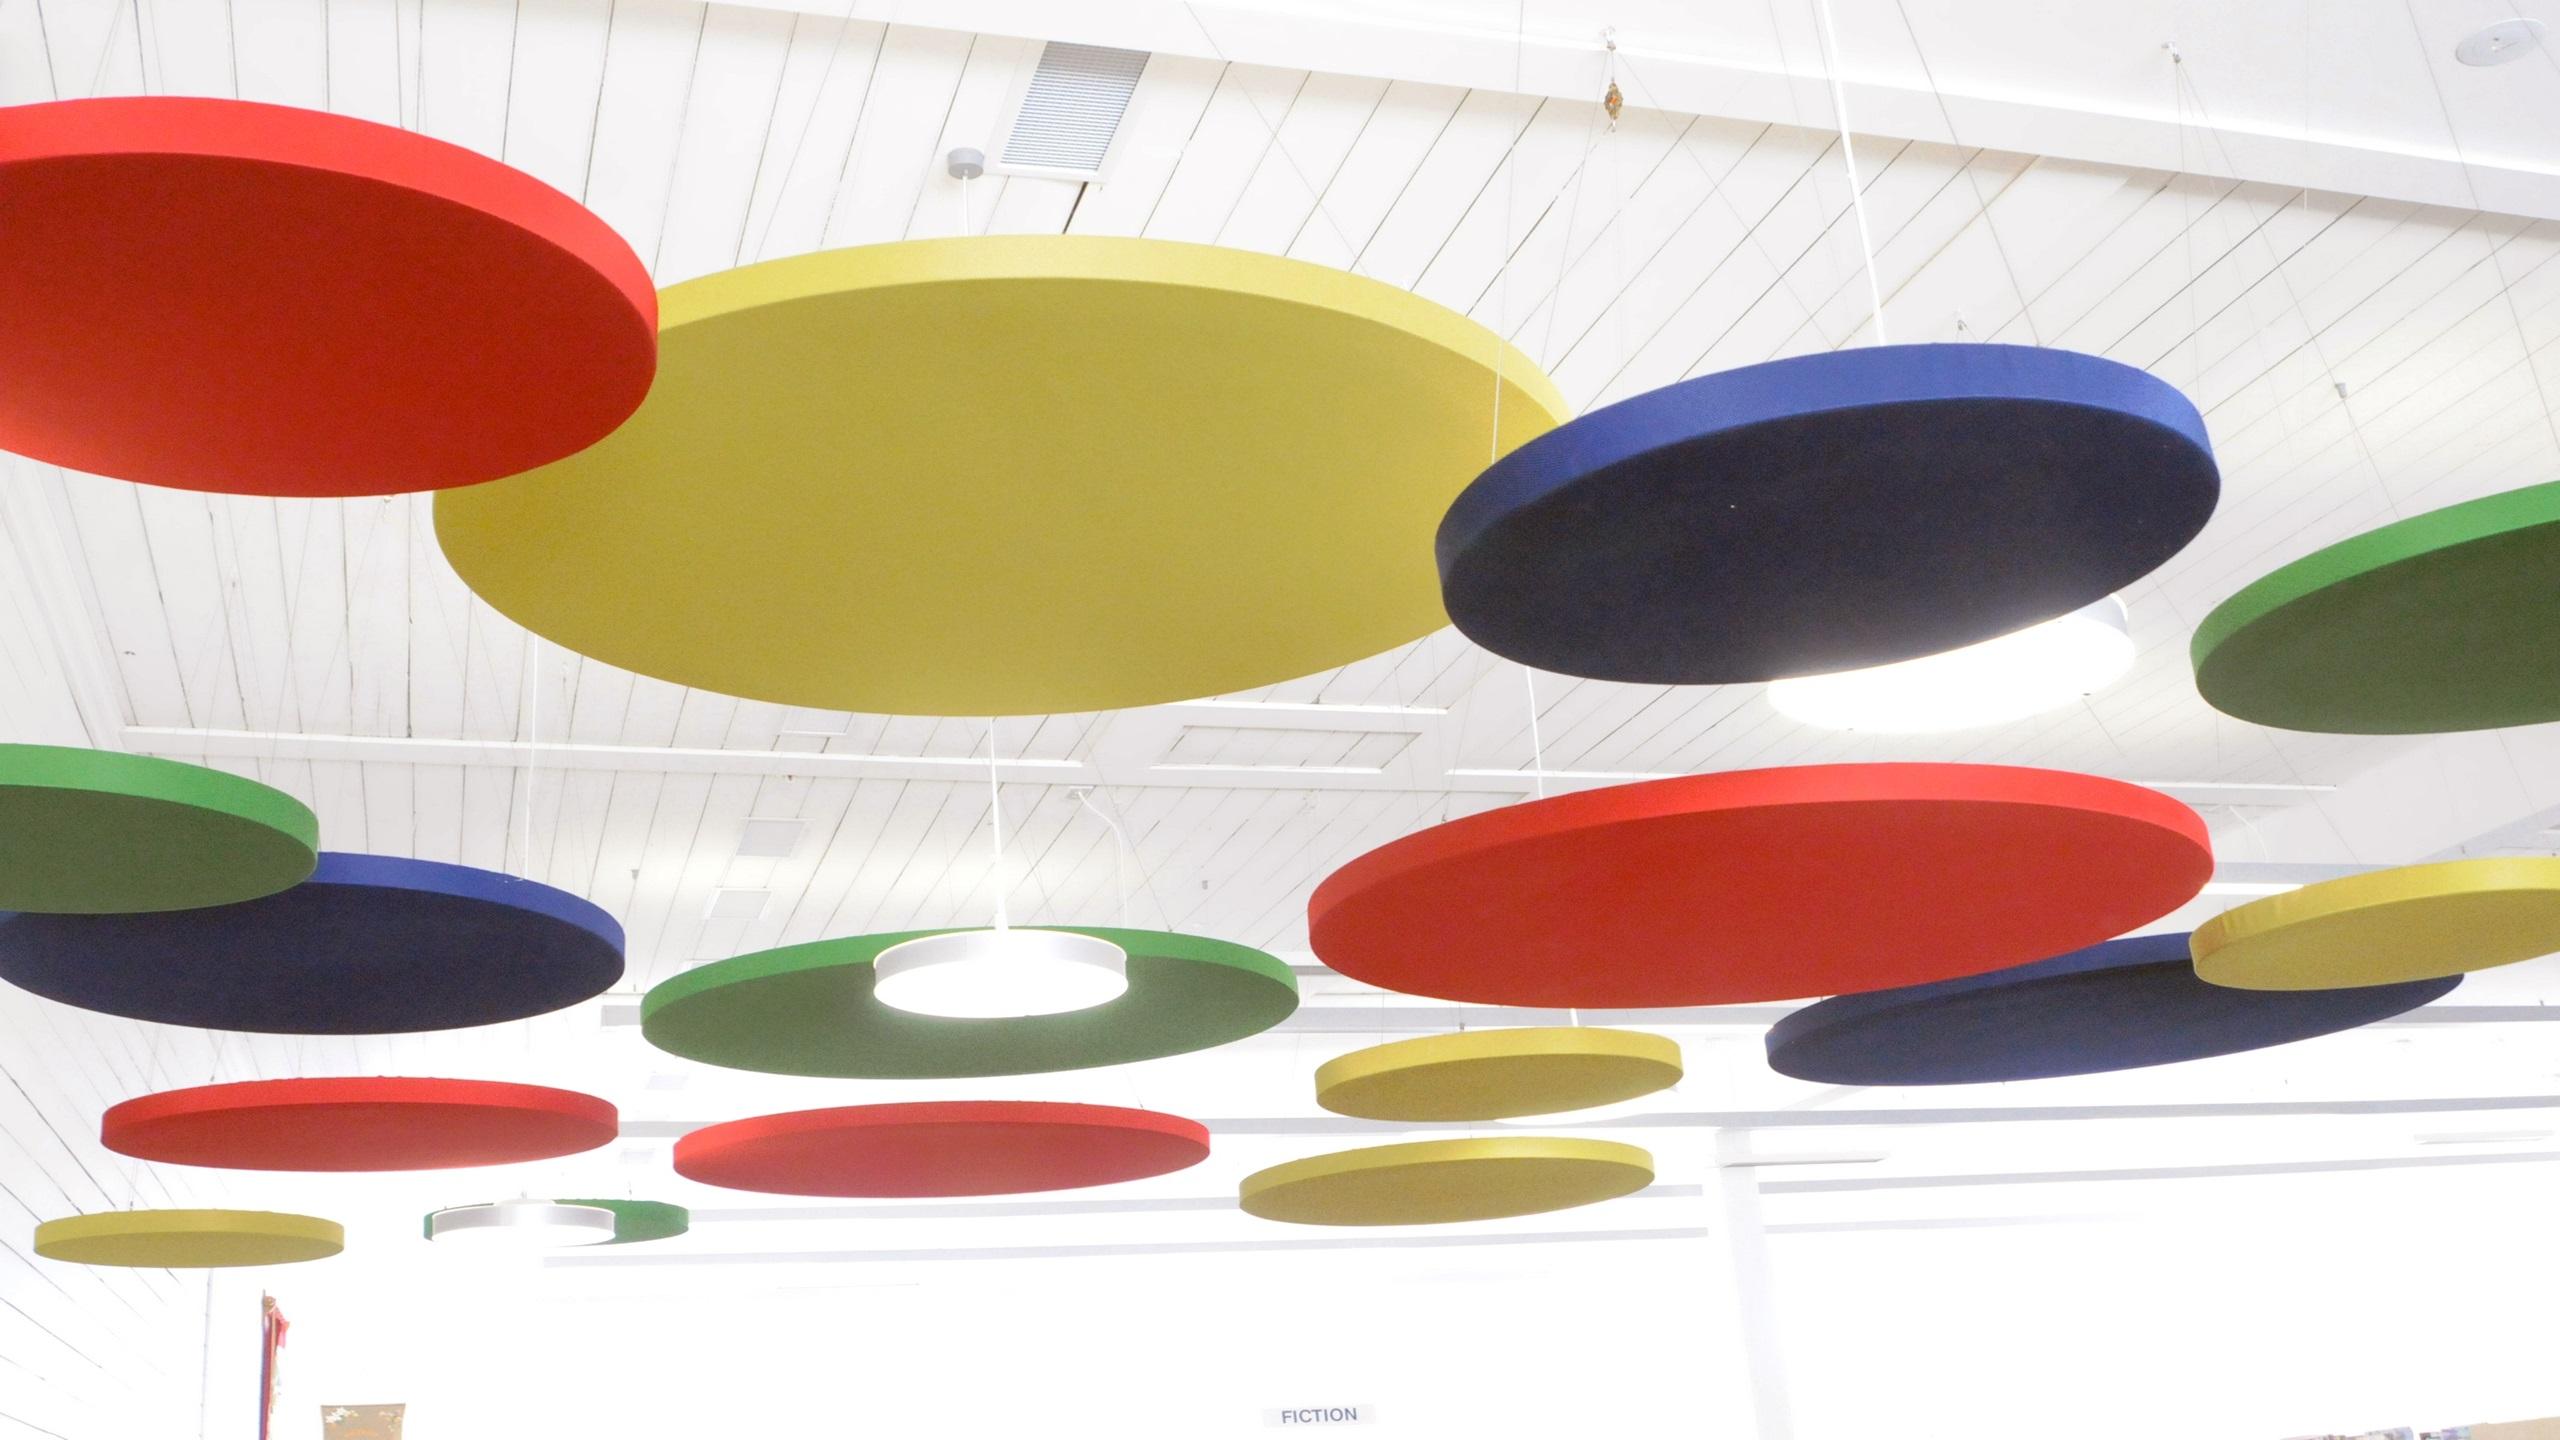 Carterton Events Centre - Triton Sound Shapes, Circles